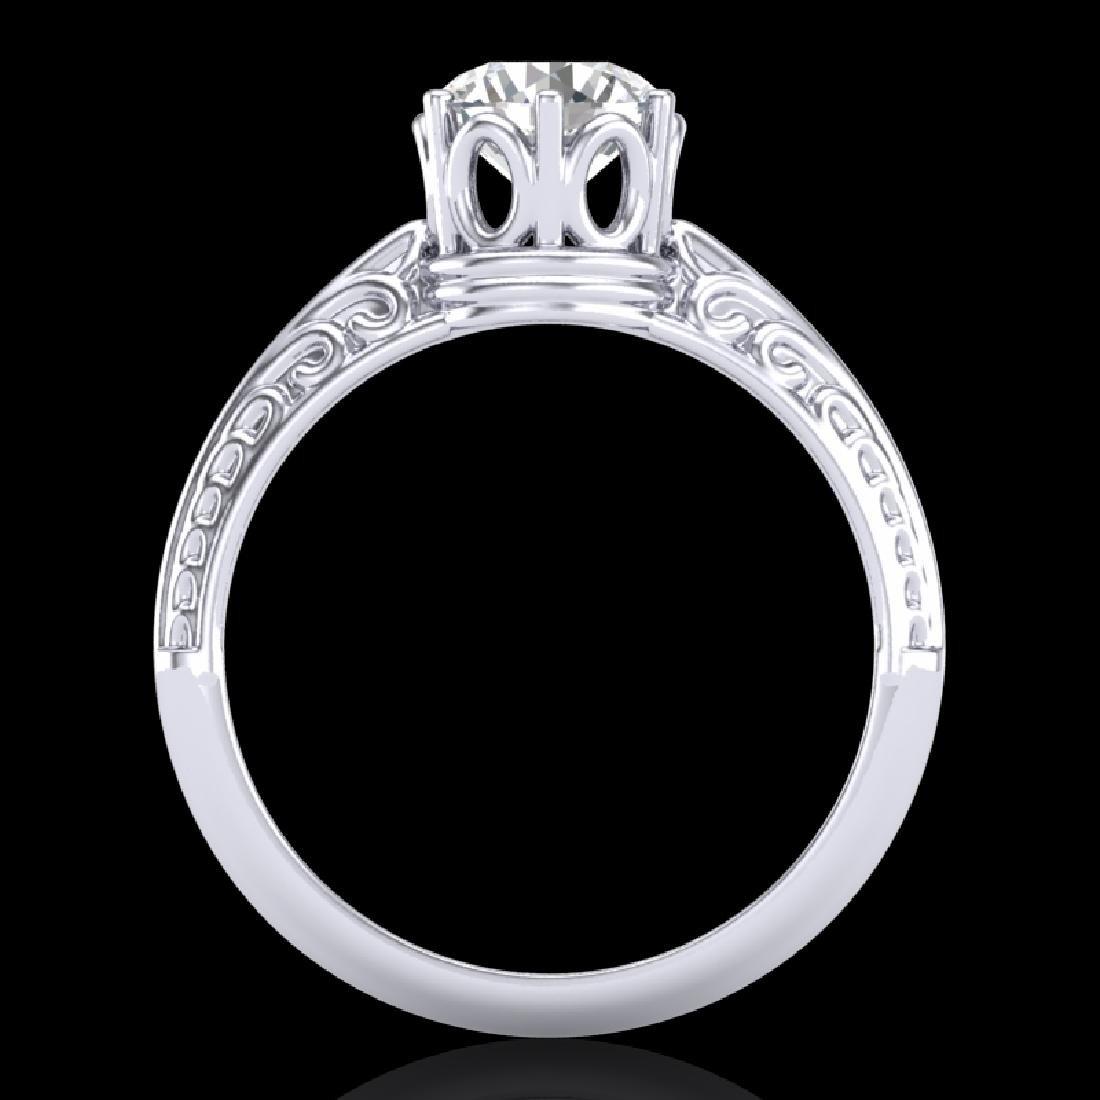 1 CTW VS/SI Diamond Art Deco Ring 18K White Gold - 3